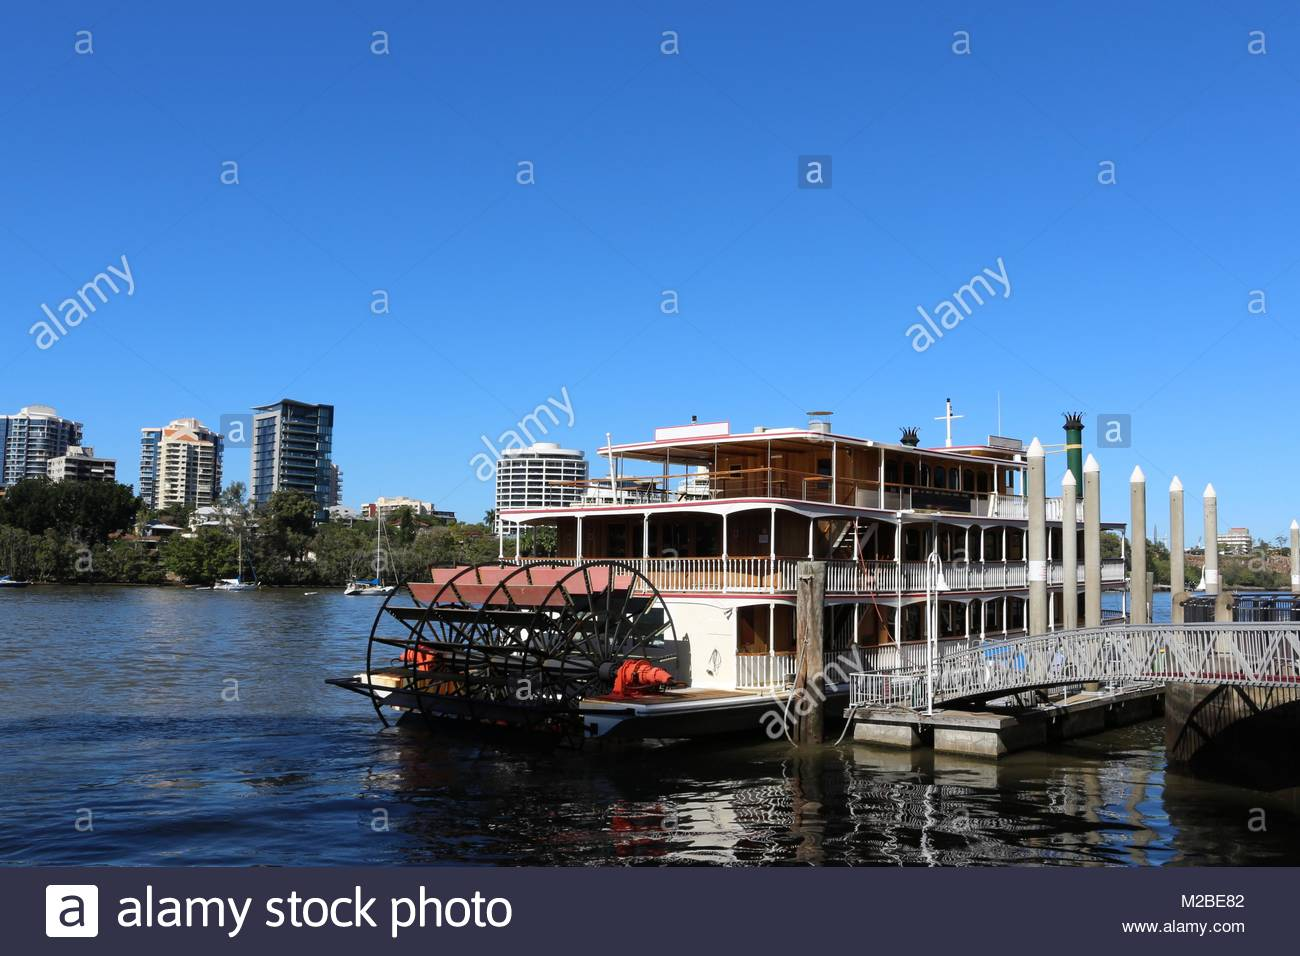 Paddle wheel boat cruises Brisbane river in Australia - Stock Image